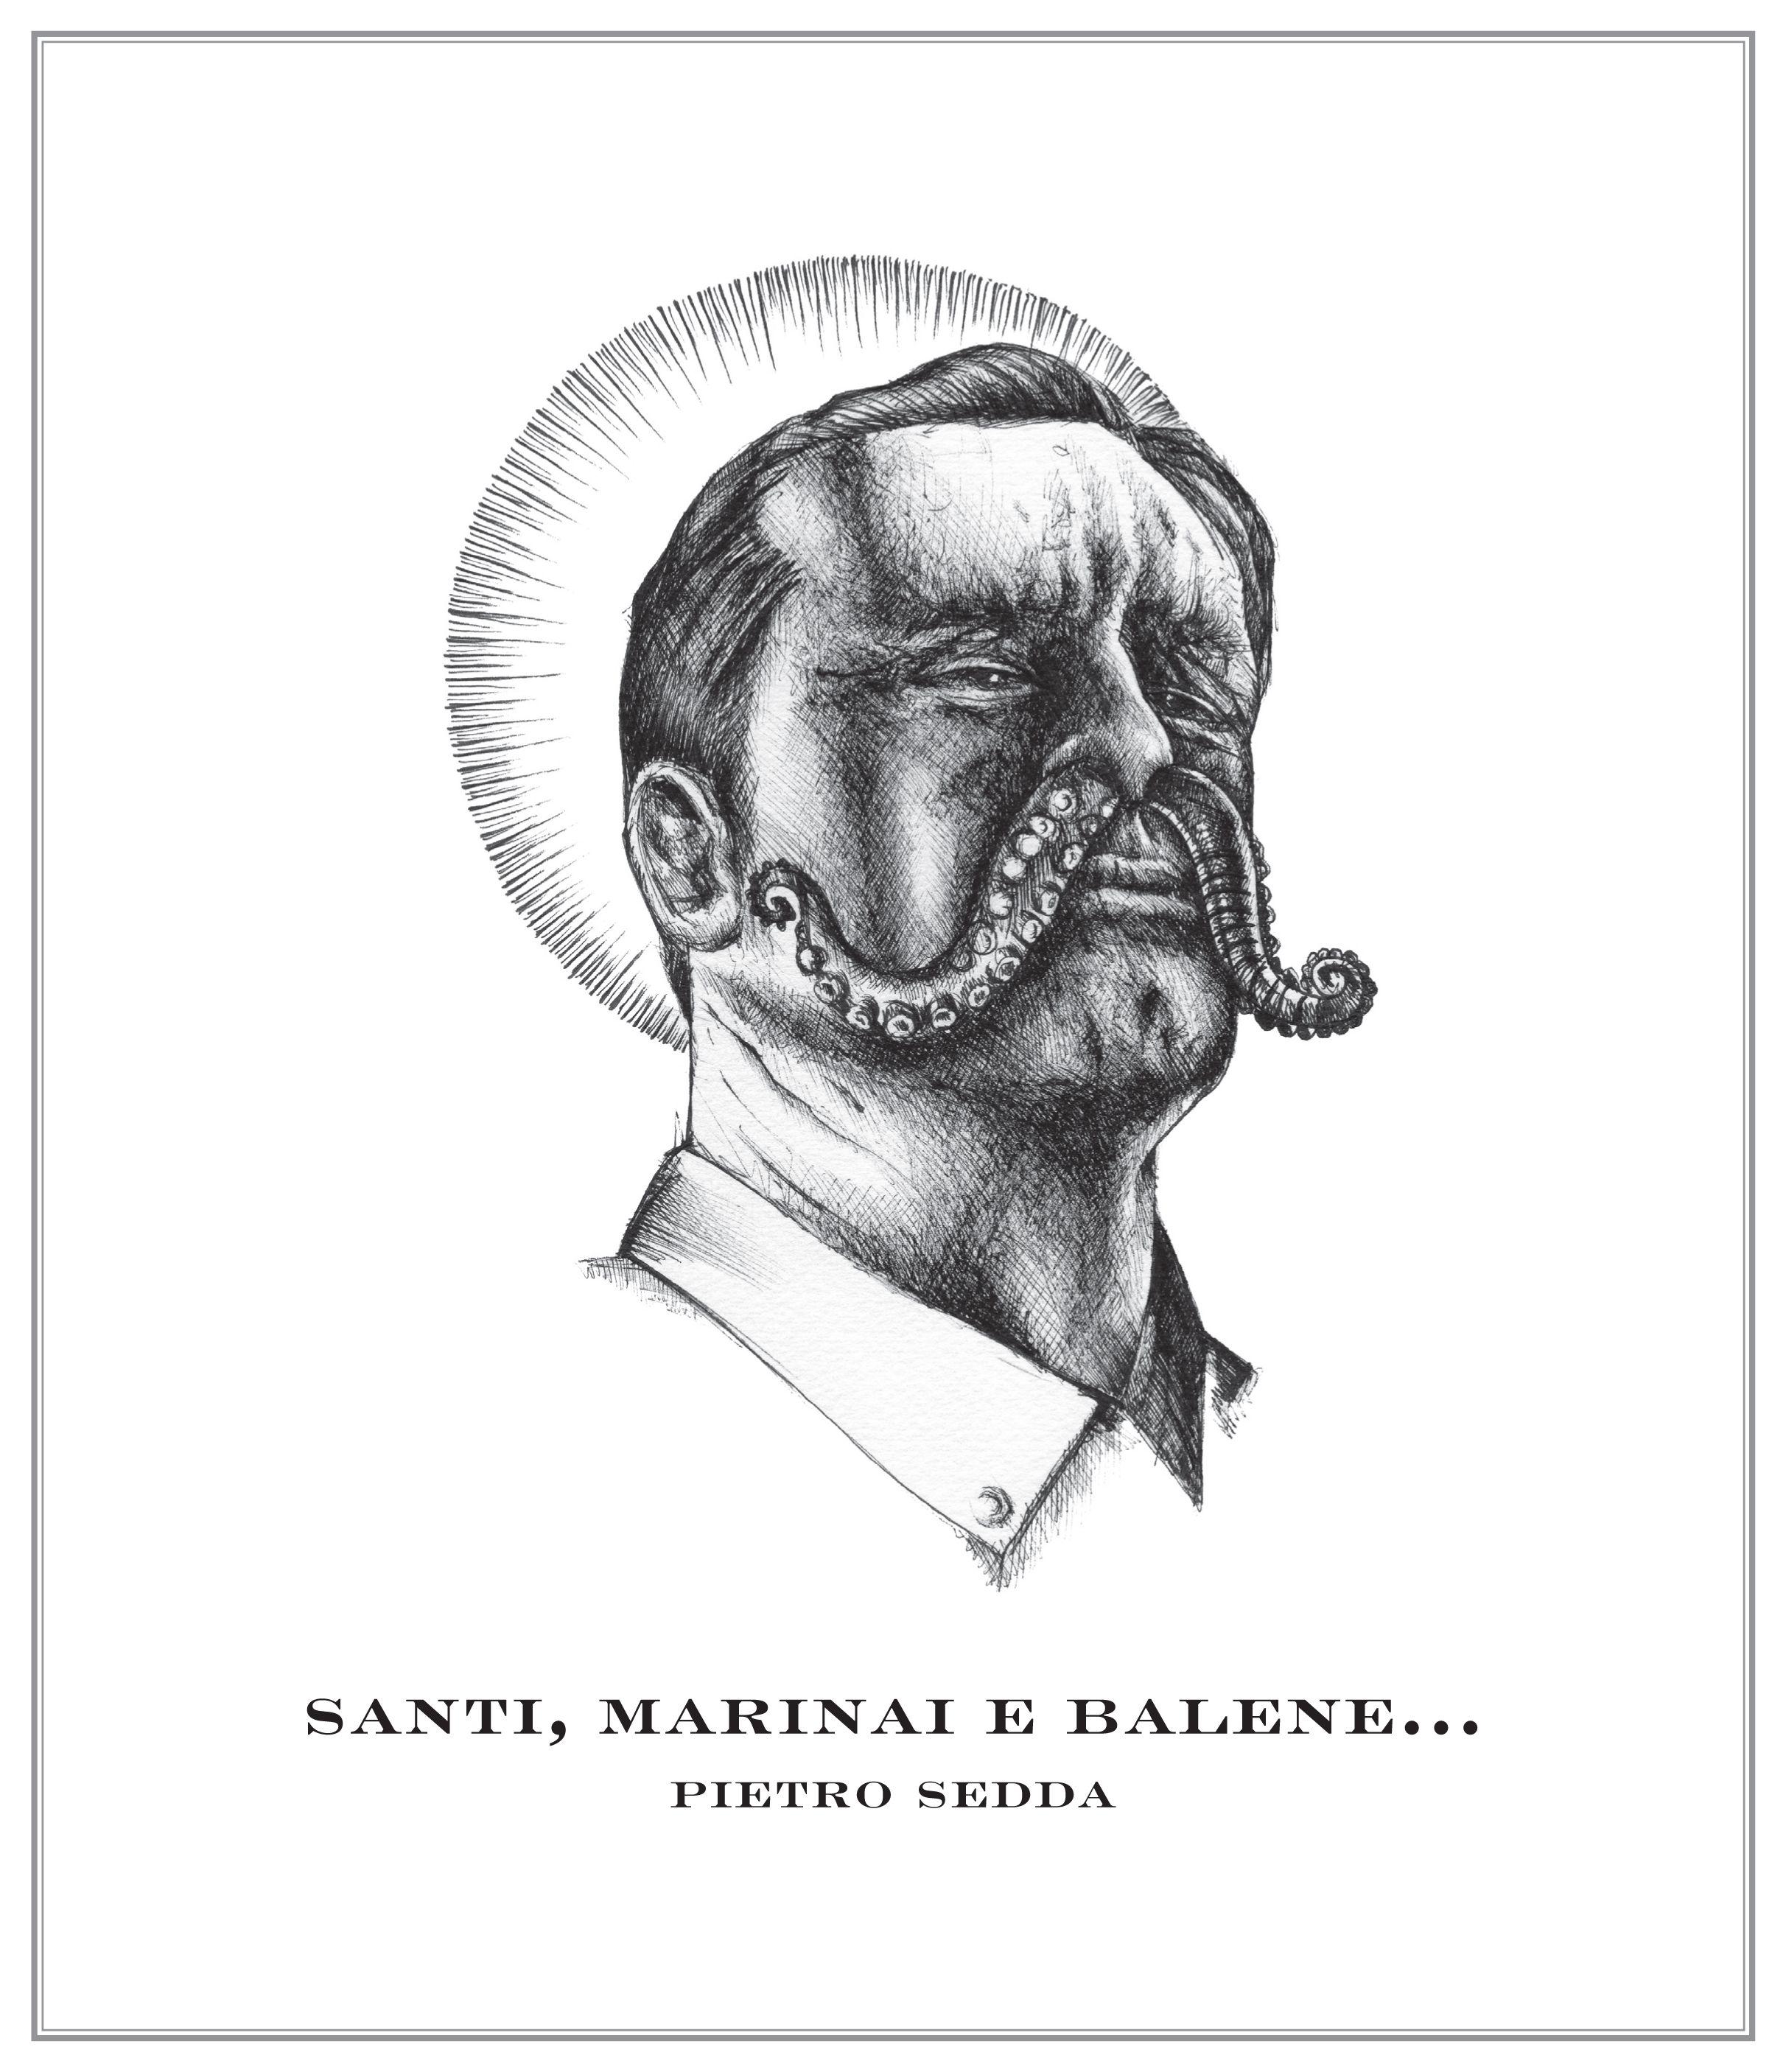 Pietro Sedda Santi, Marinai e Balene..